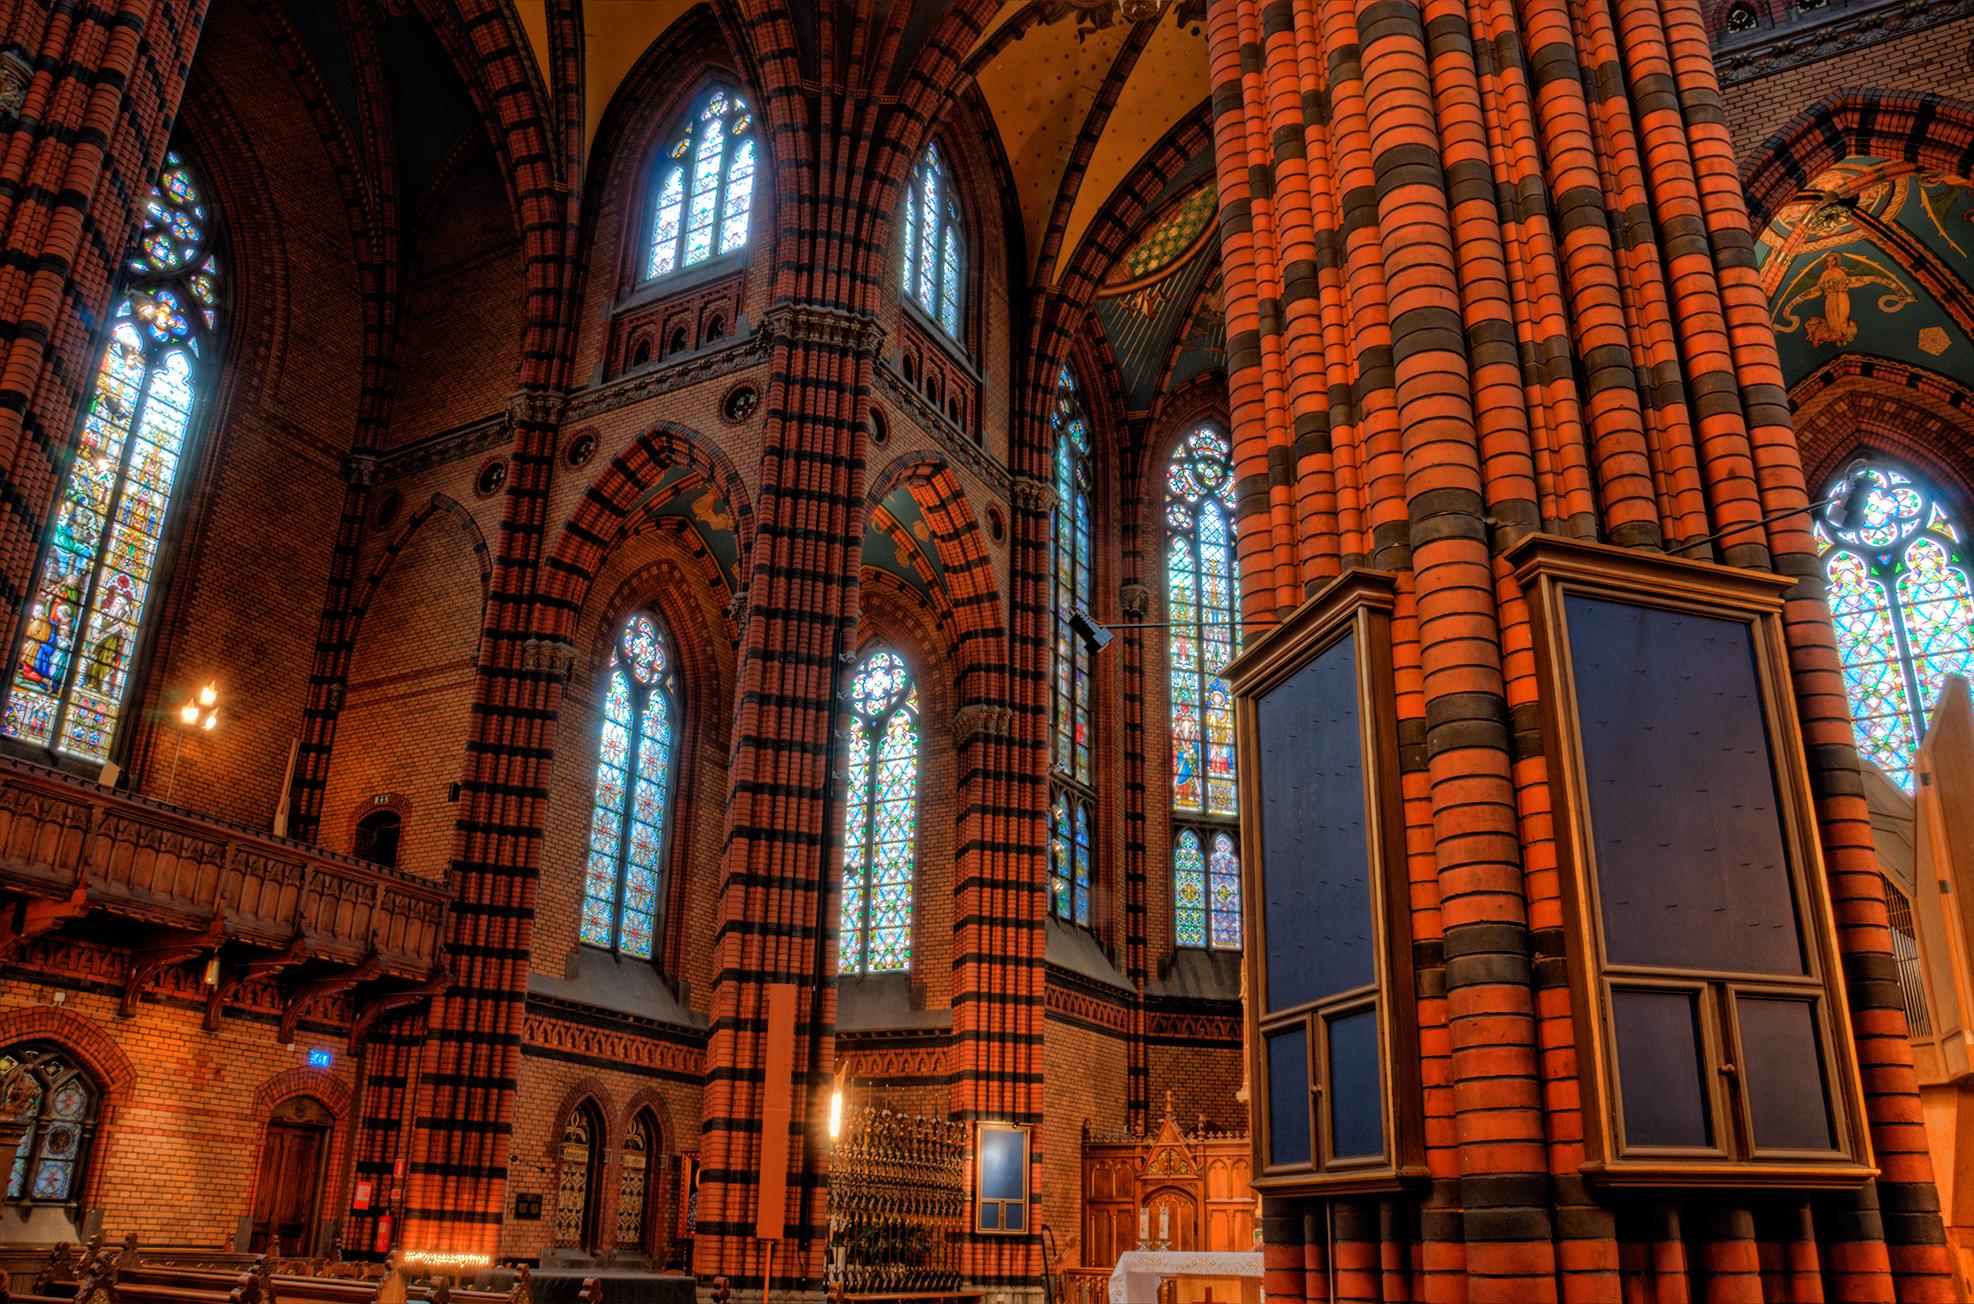 St. Johannes Church IV by HenrikSundholm